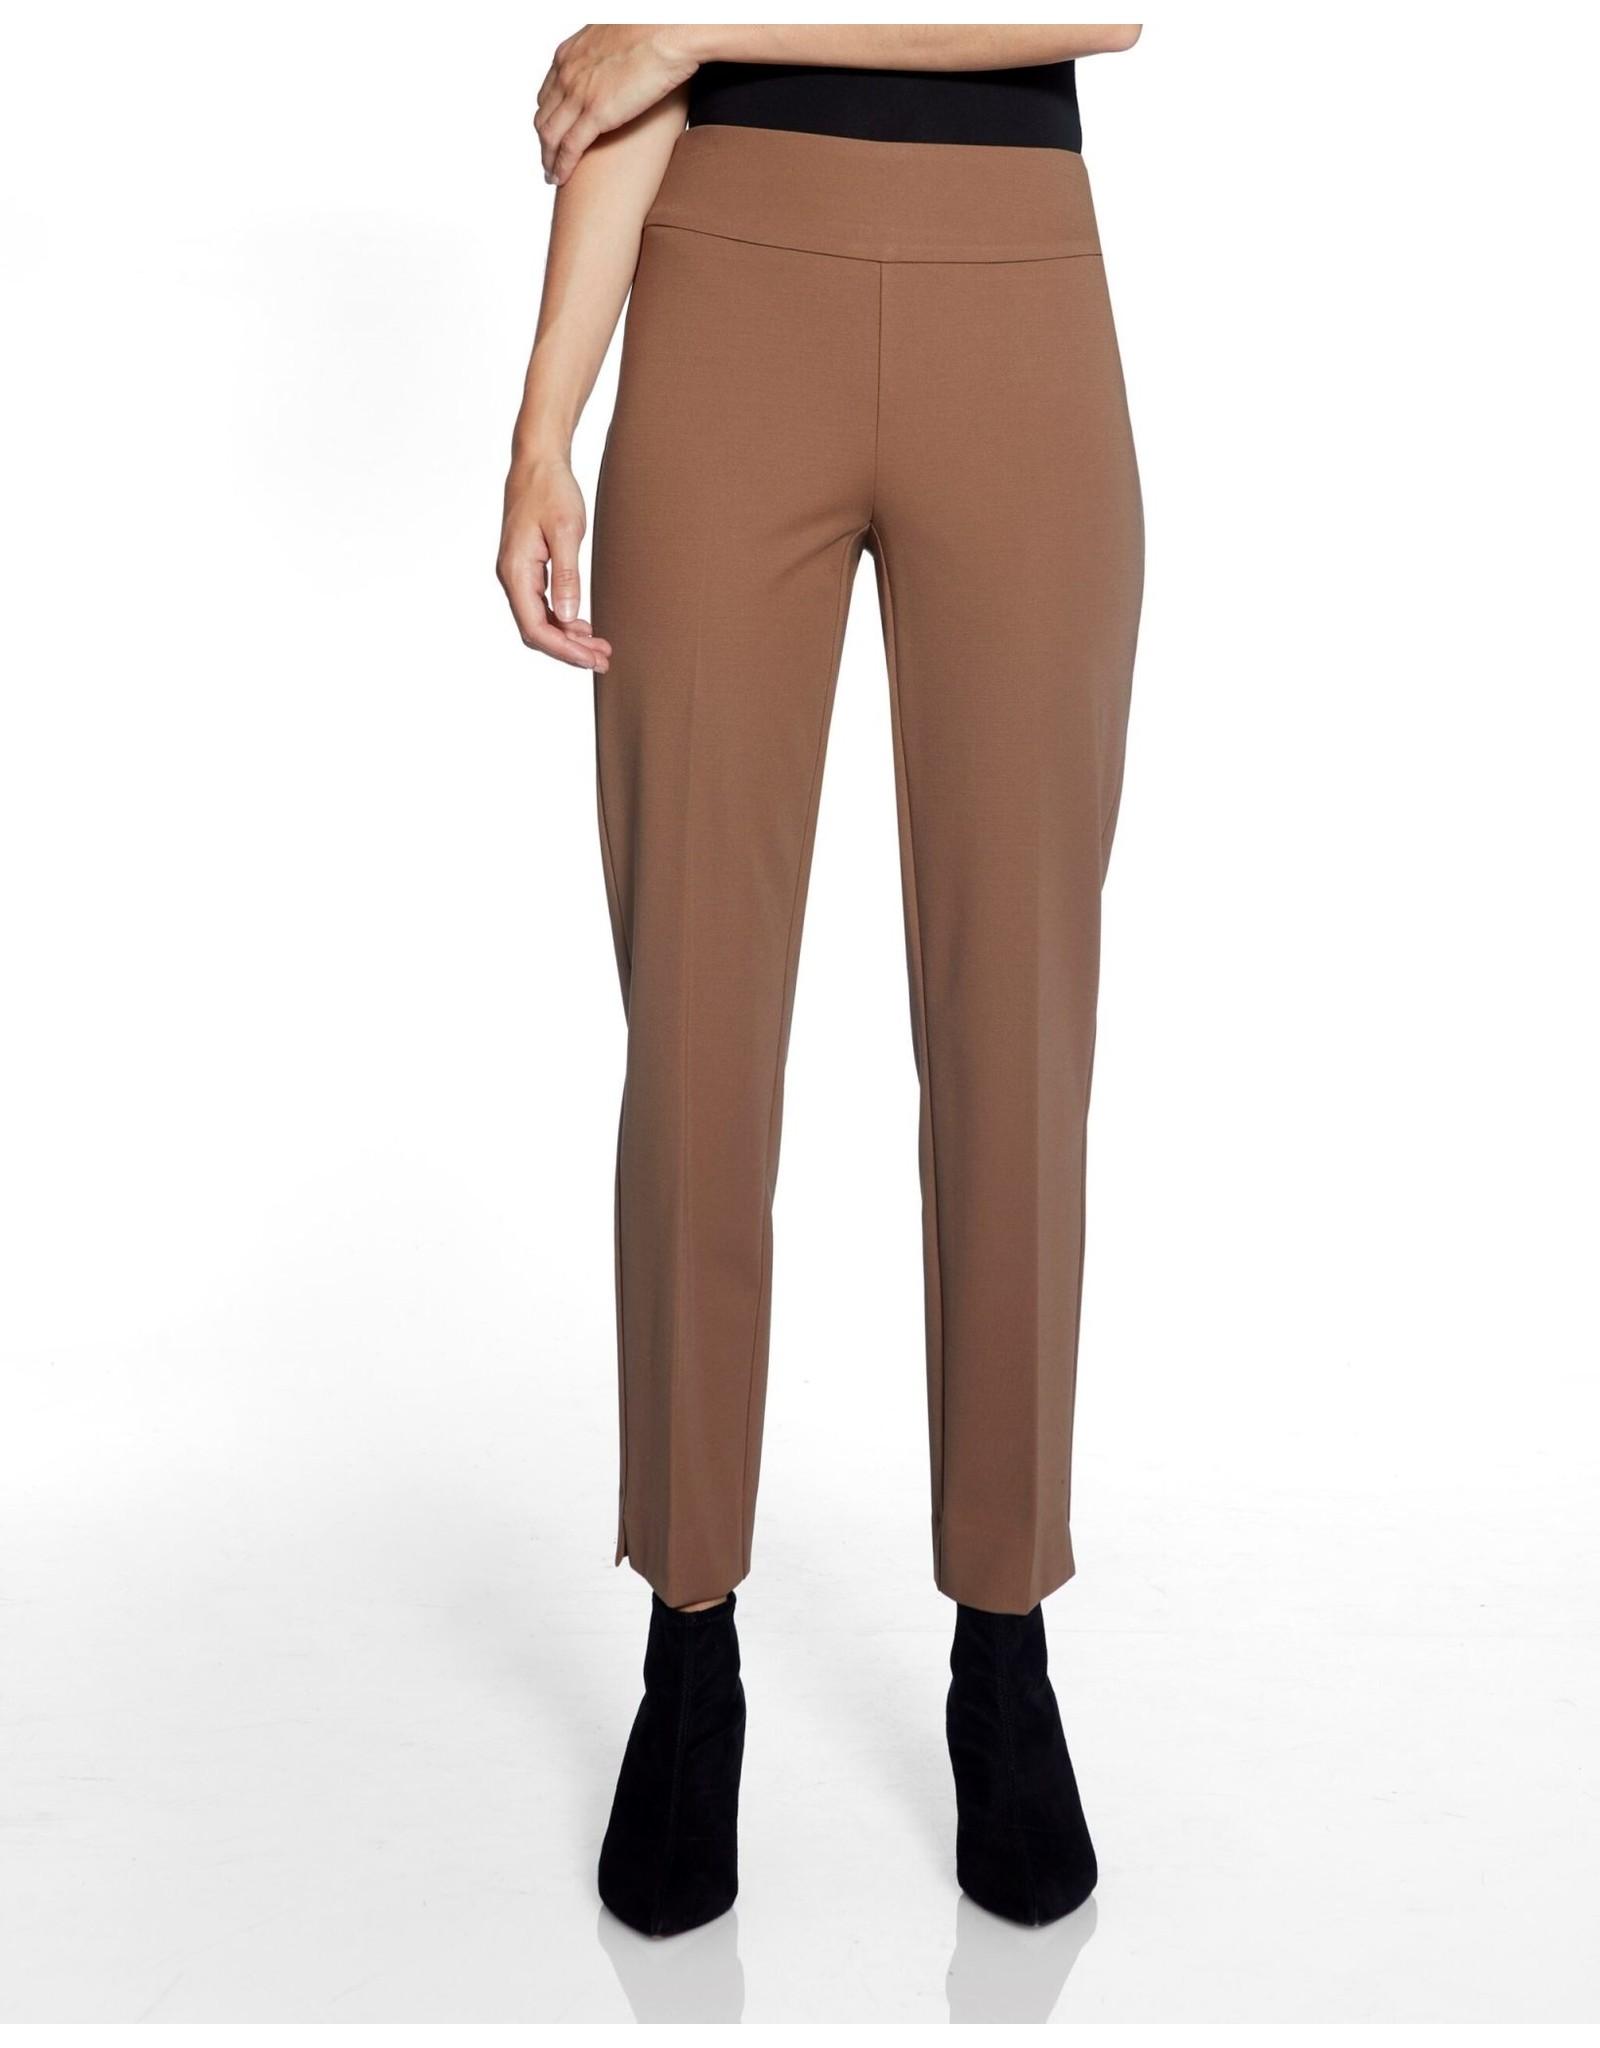 UP Pantalon Compression Side Slit